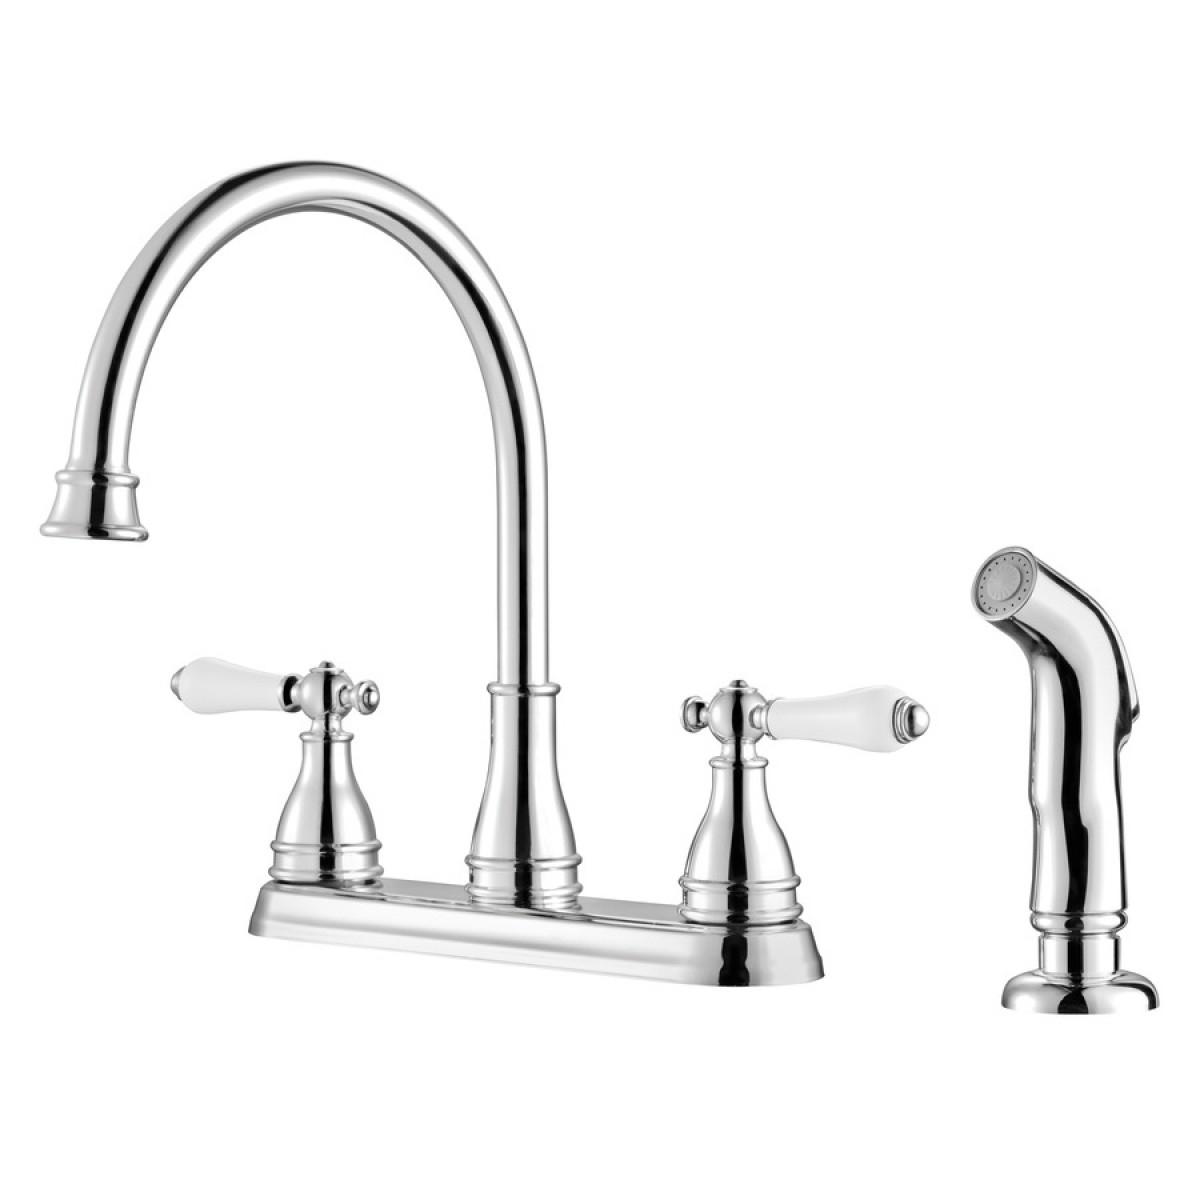 Ideas, pfister sonterra kitchen faucet pfister sonterra kitchen faucet pfister sonterra two handle widespread lead free kitchen faucet 1200 x 1200  .